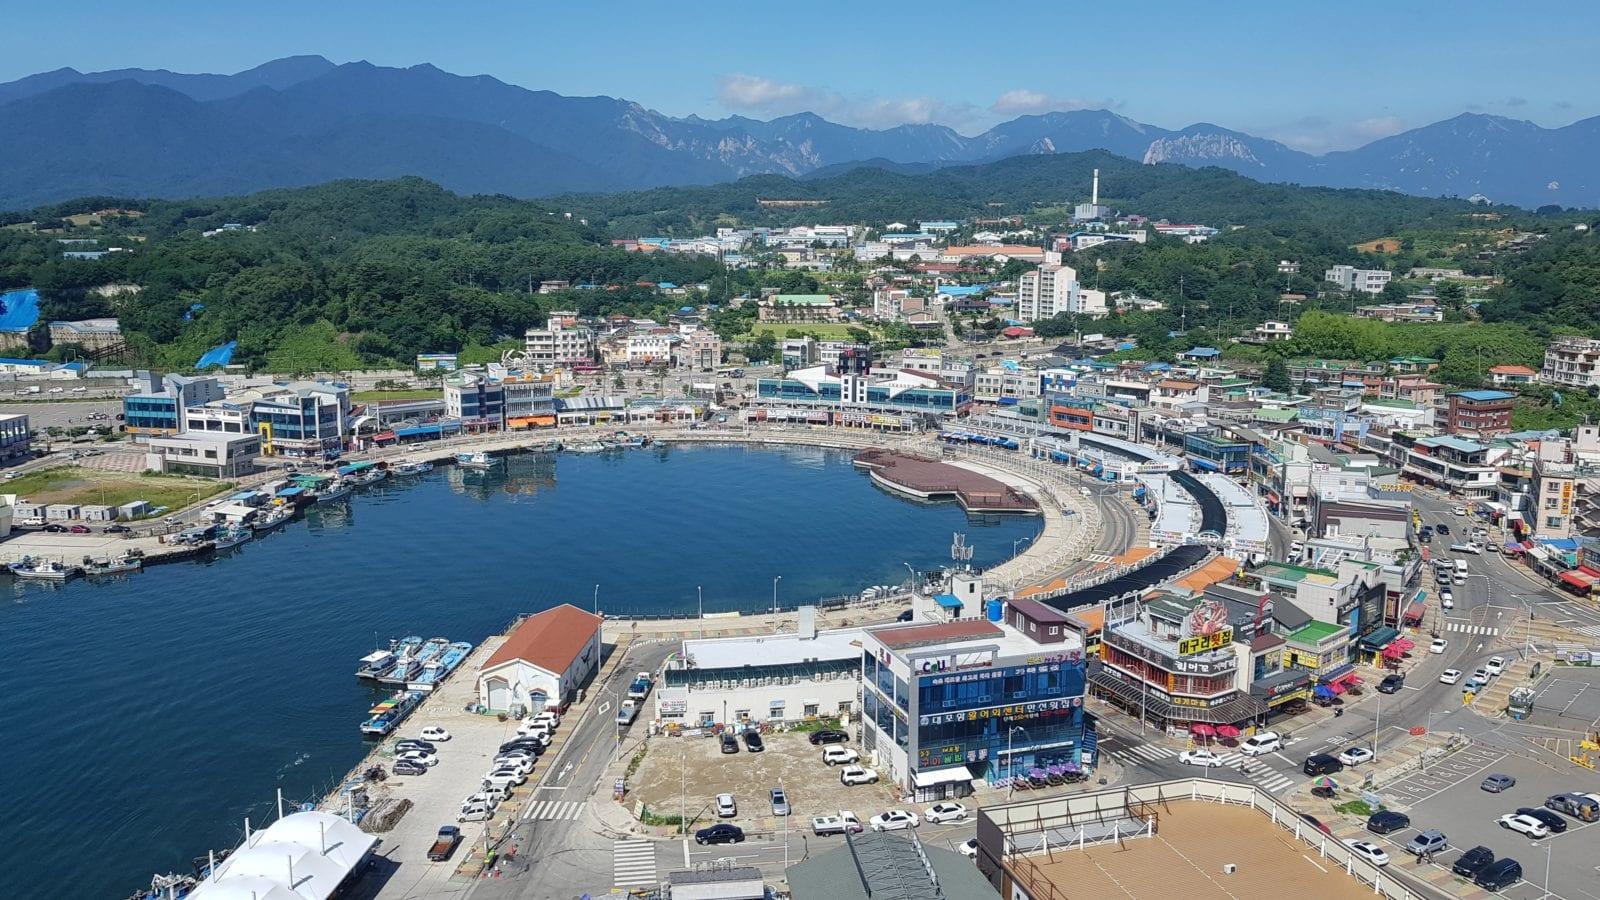 Daepohang Port (대포항) | Sokcho-si, Gangwon-do